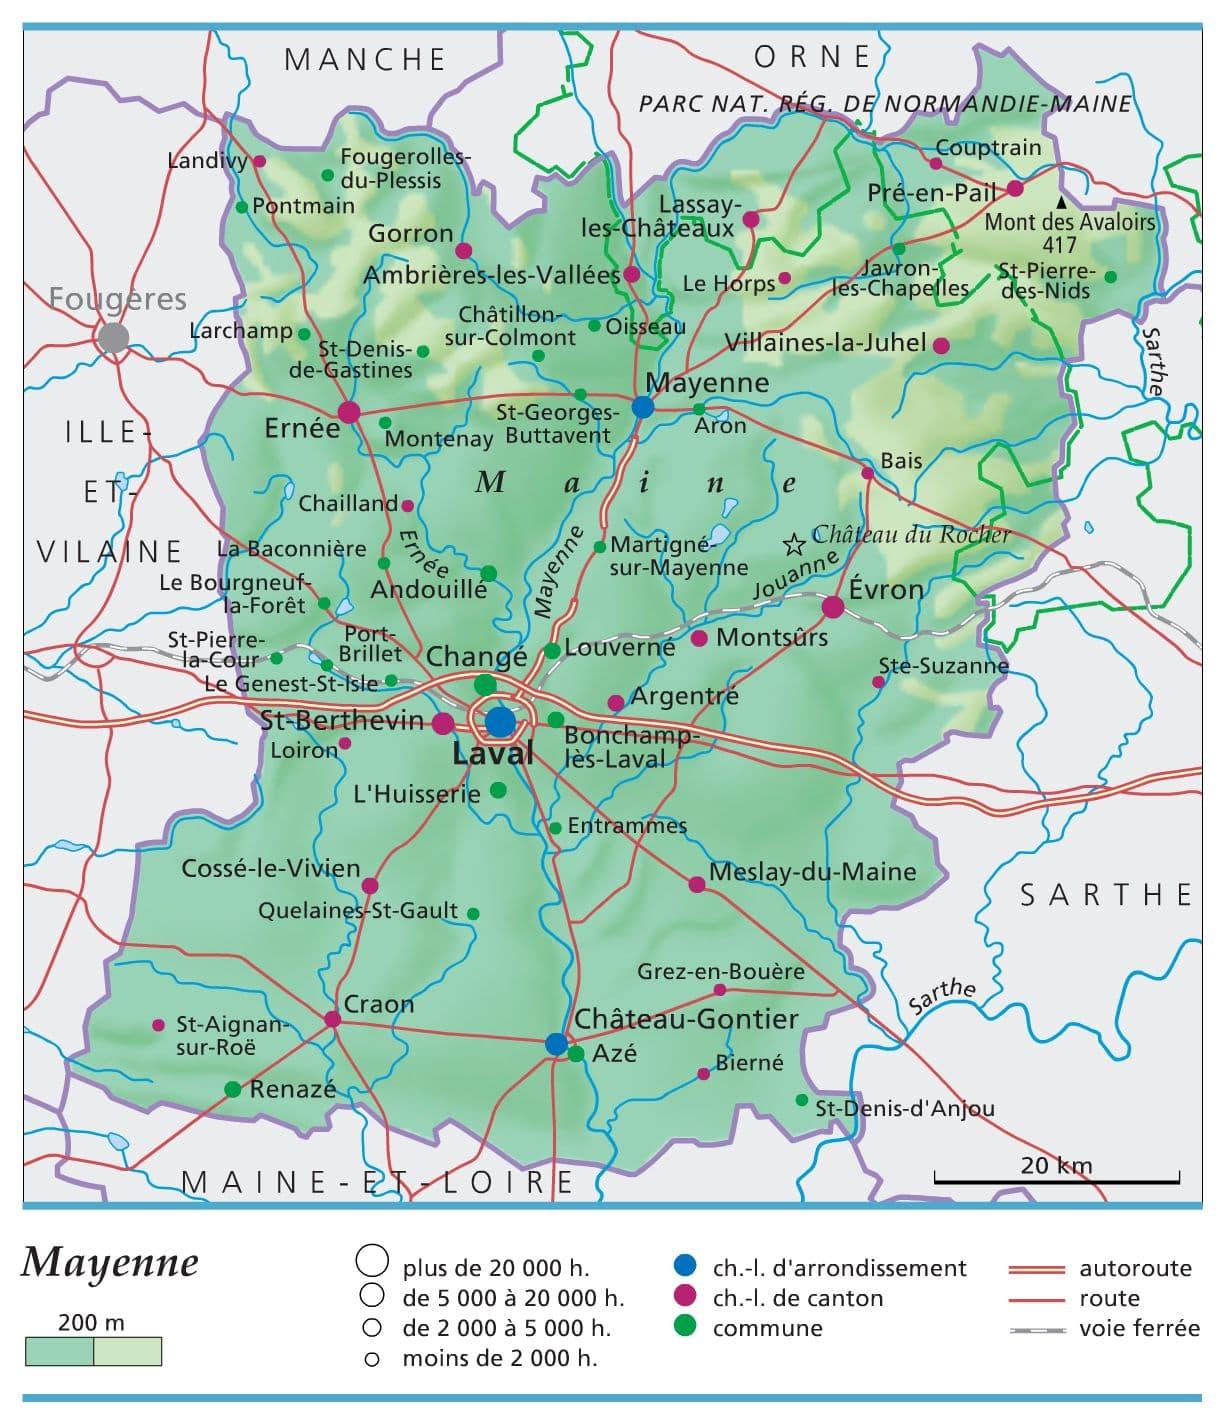 Encyclop die larousse en ligne mayenne - Les toiles de mayenne ...